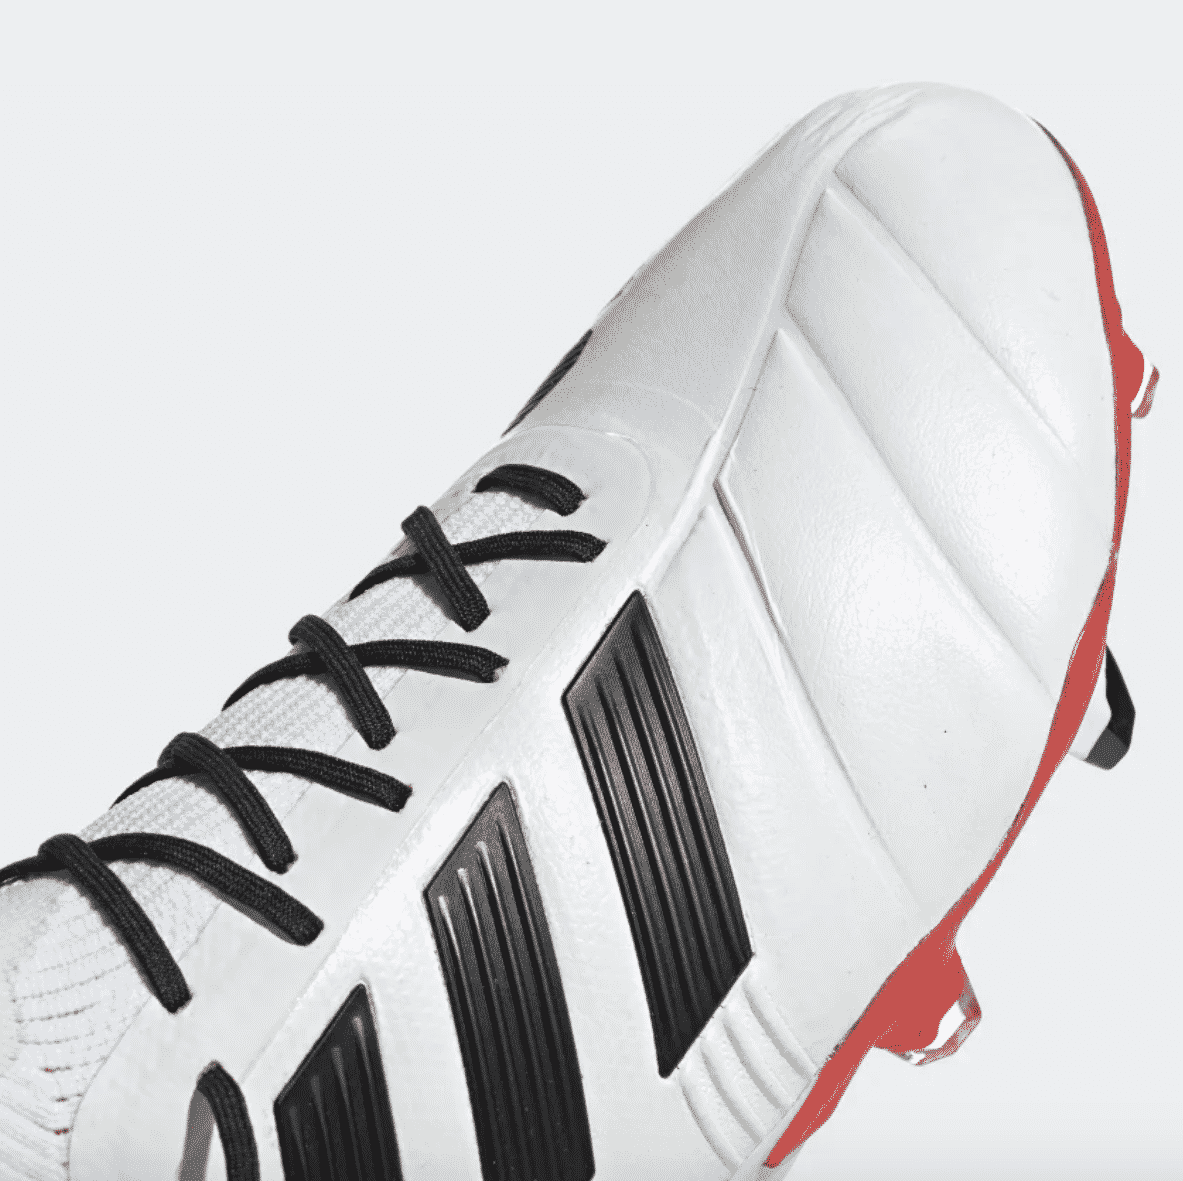 adidas-predator-19.1-reedition-predator-mania-blanc-8